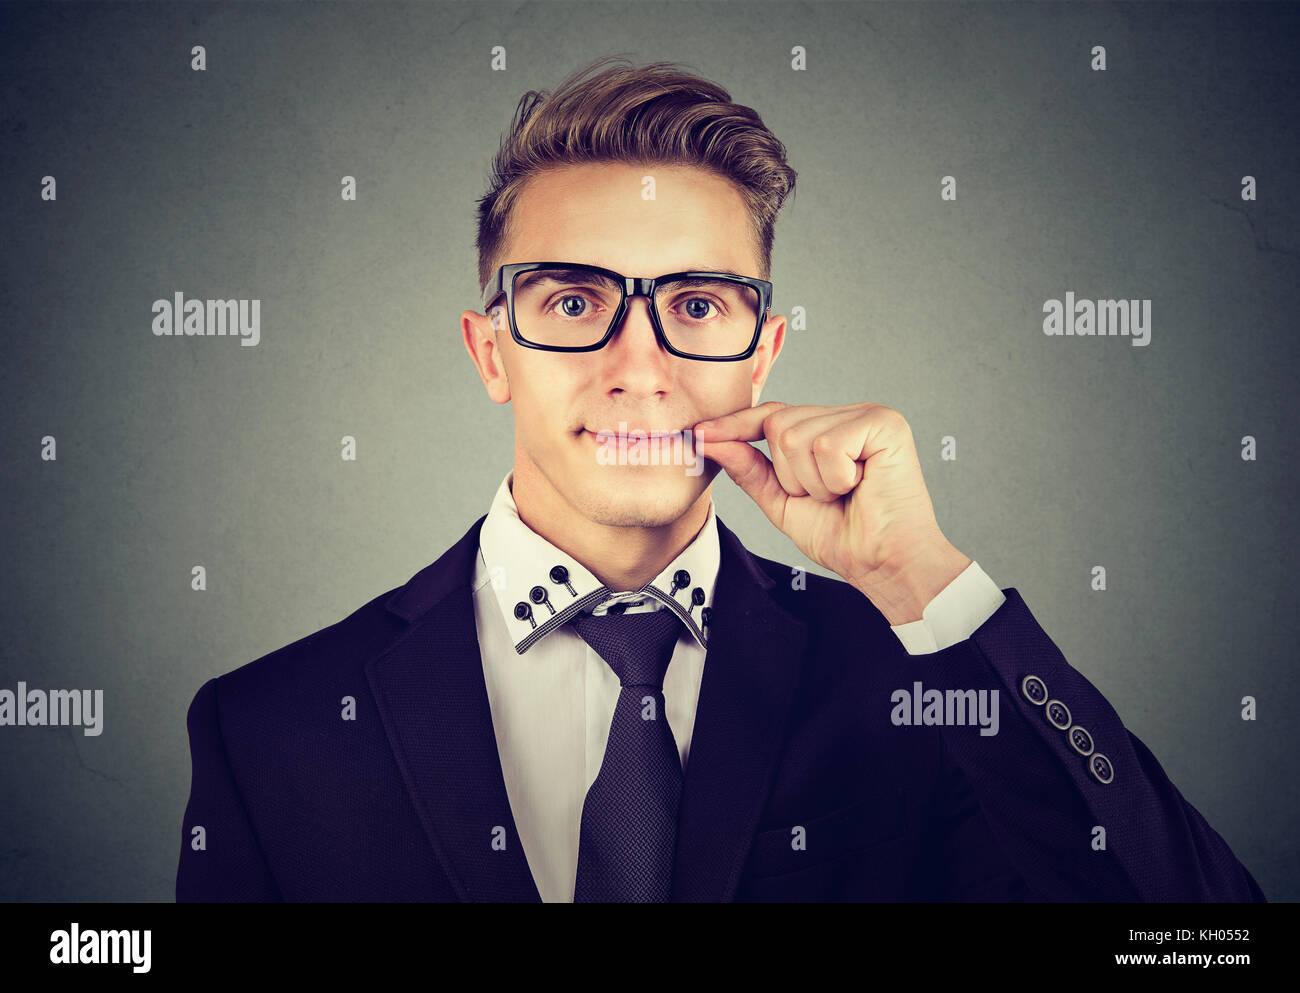 Keep a secret, man zipping his mouth shut. Quiet concept - Stock Image